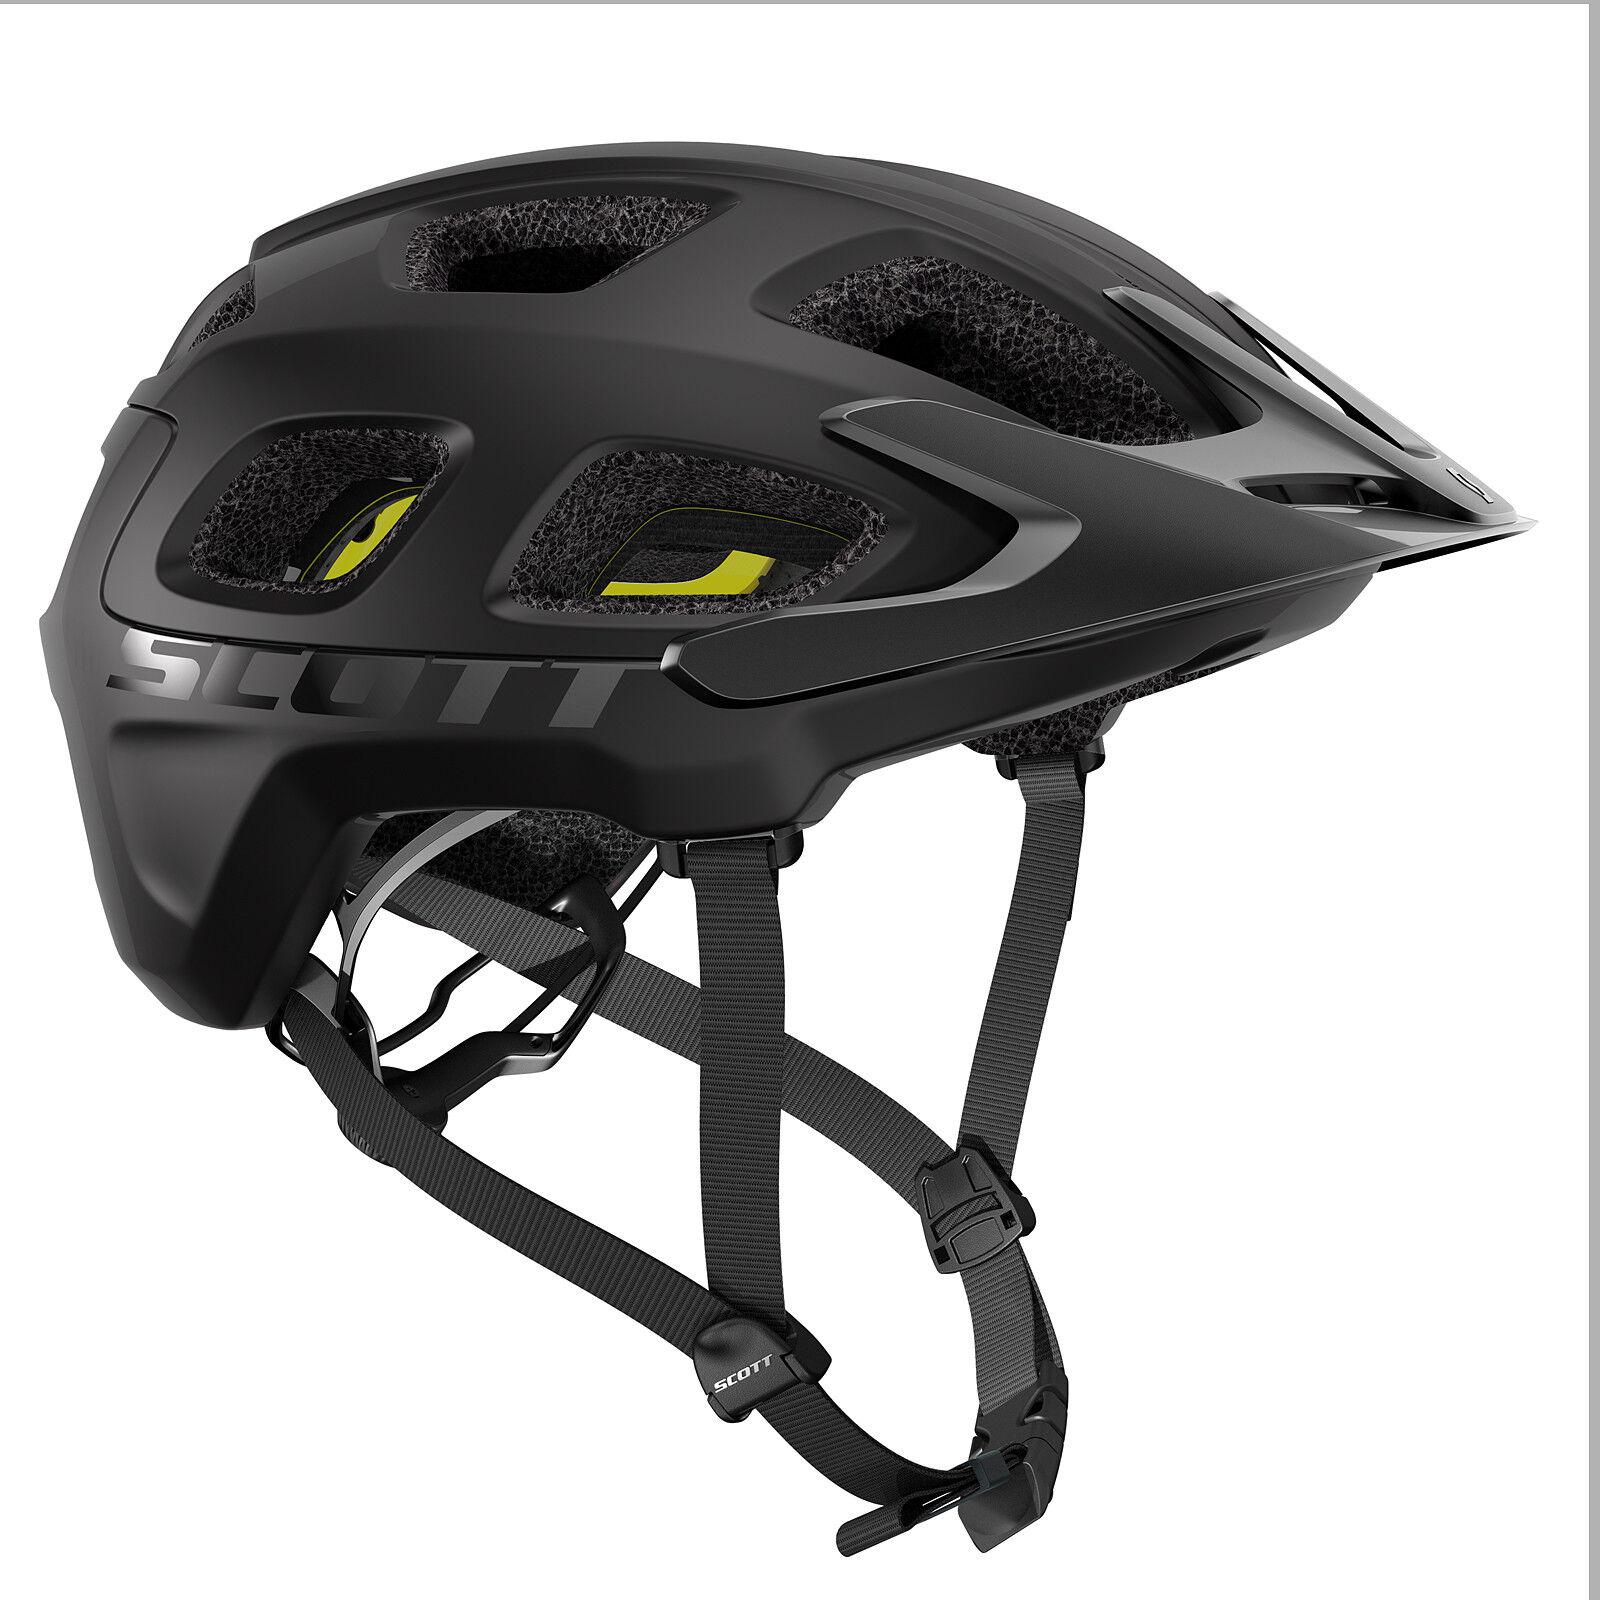 Scott Vivo Plus MTB Vélo Casque schwarz 2019